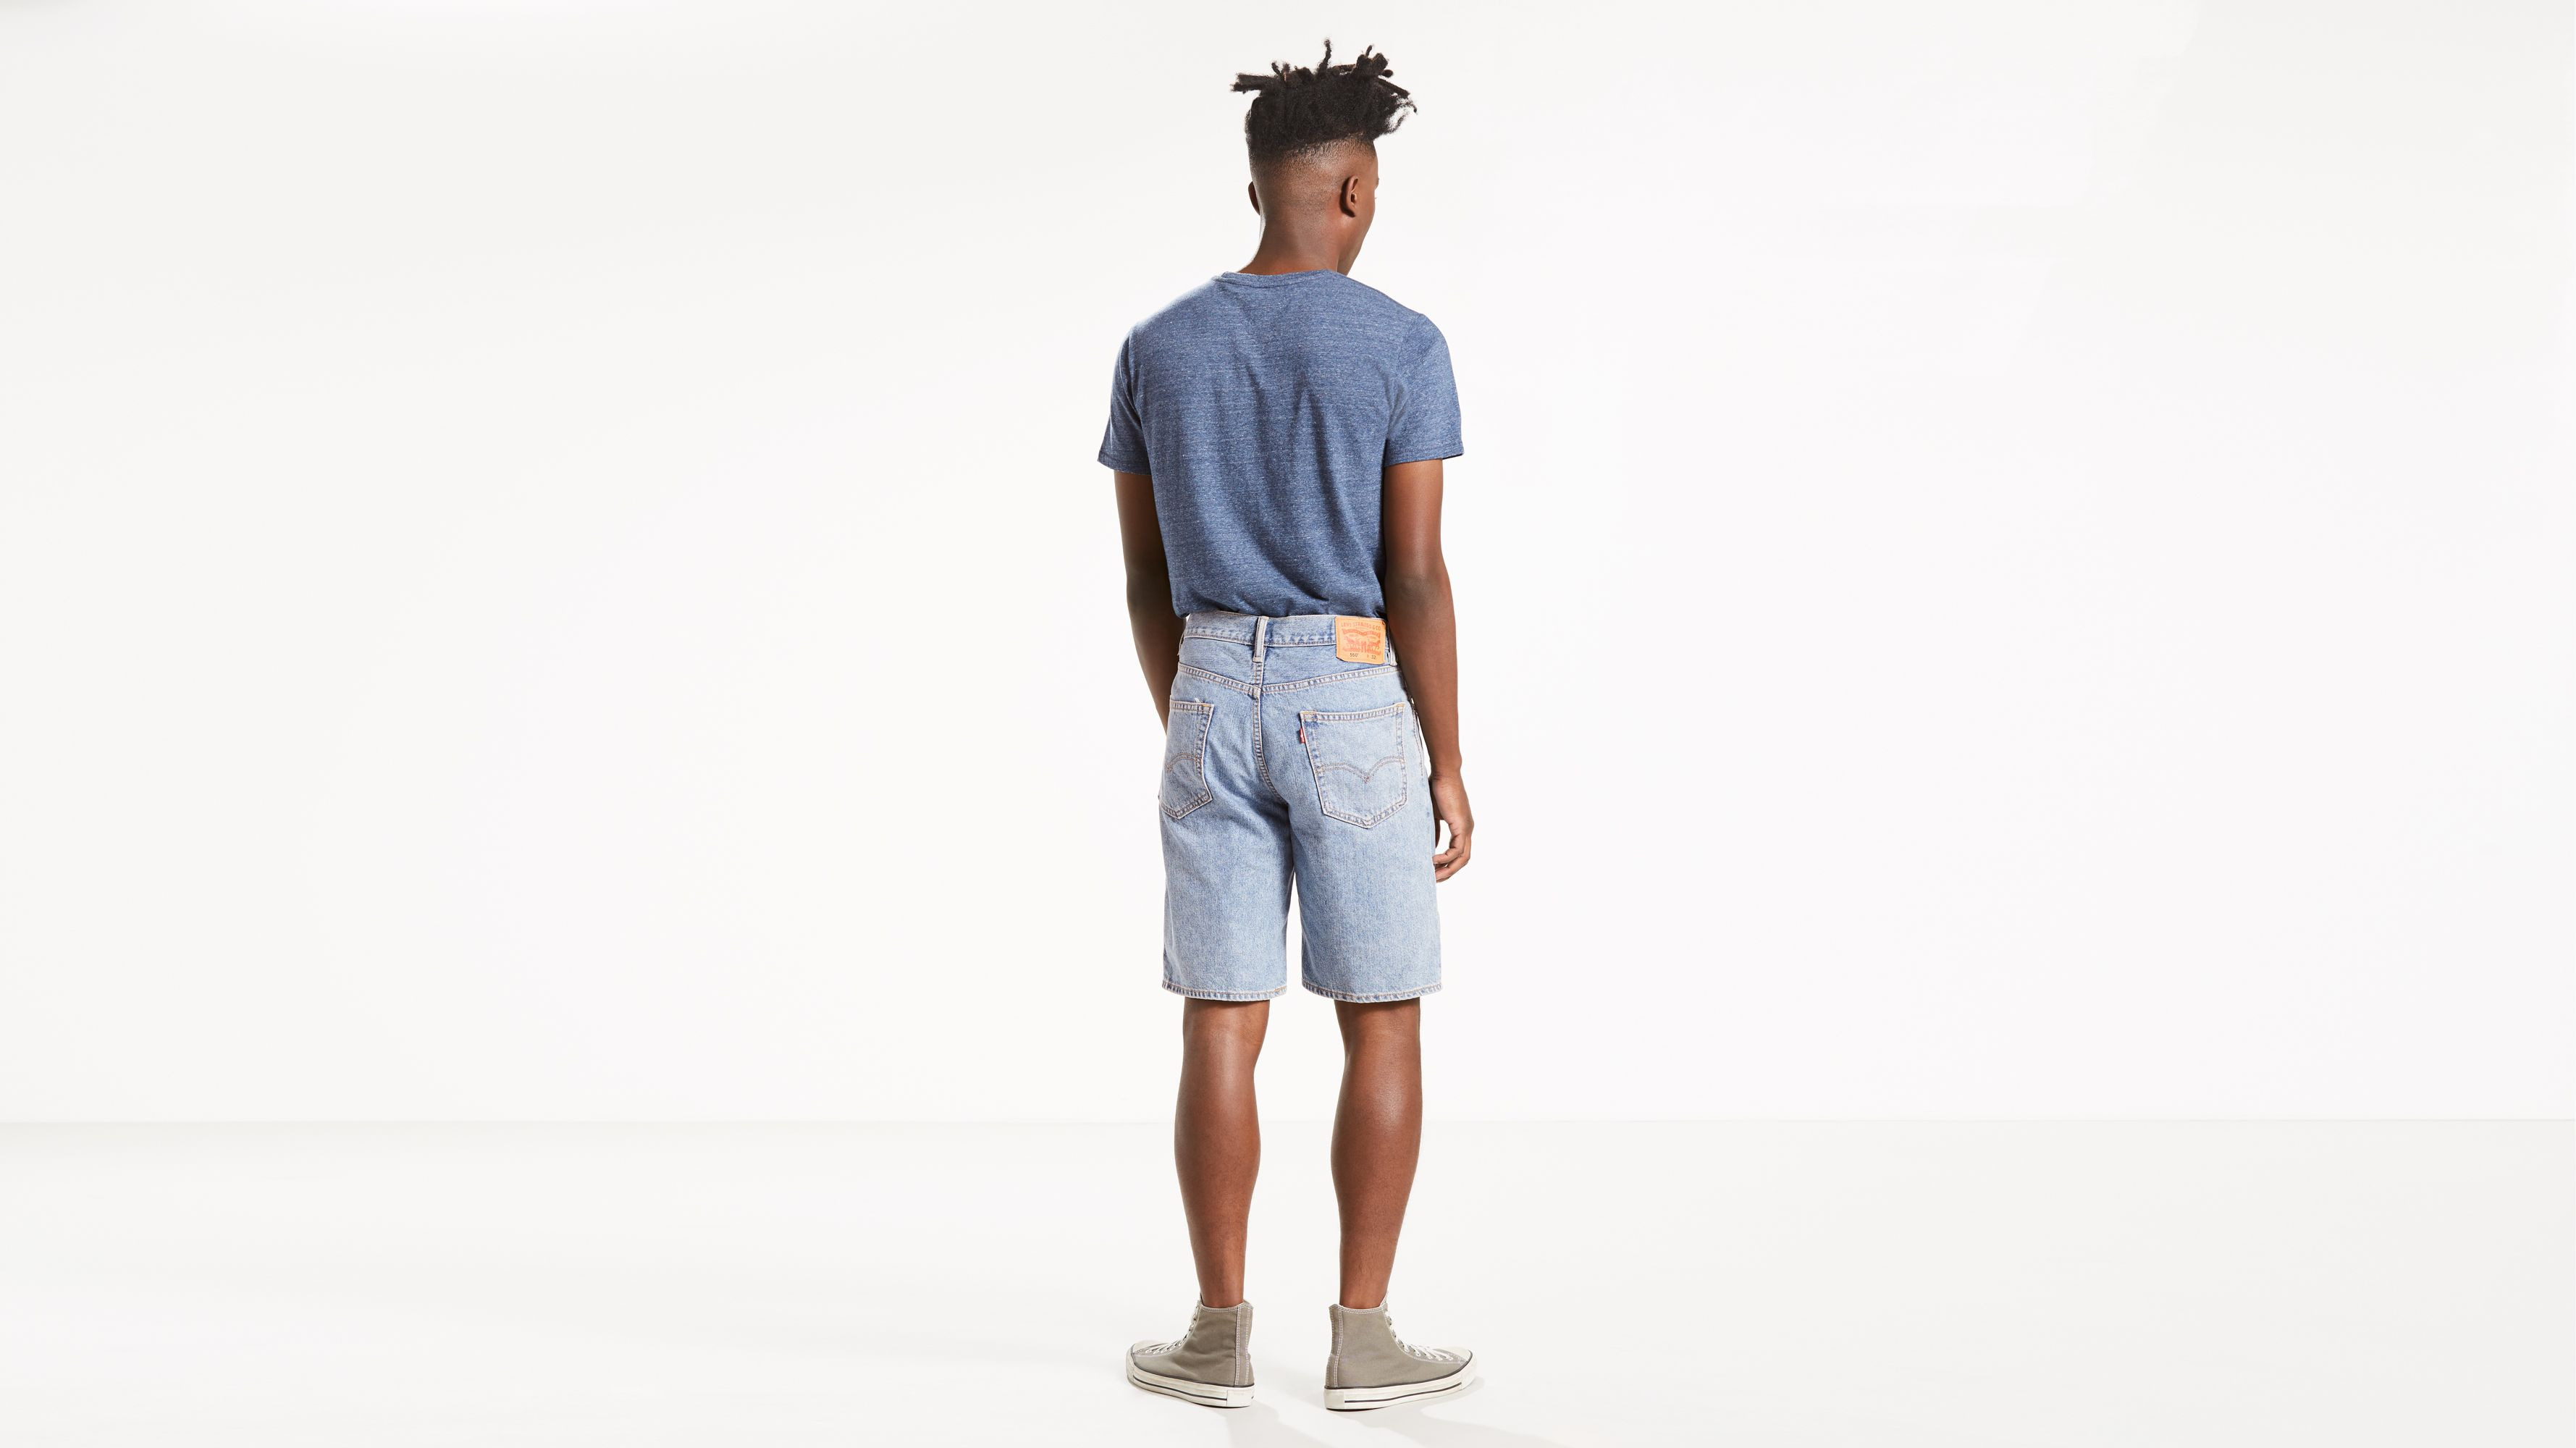 New Blac Label Denim Pieced Shorts $72 Size 44 46 48 50 52 54 56 Waist Fast Ship